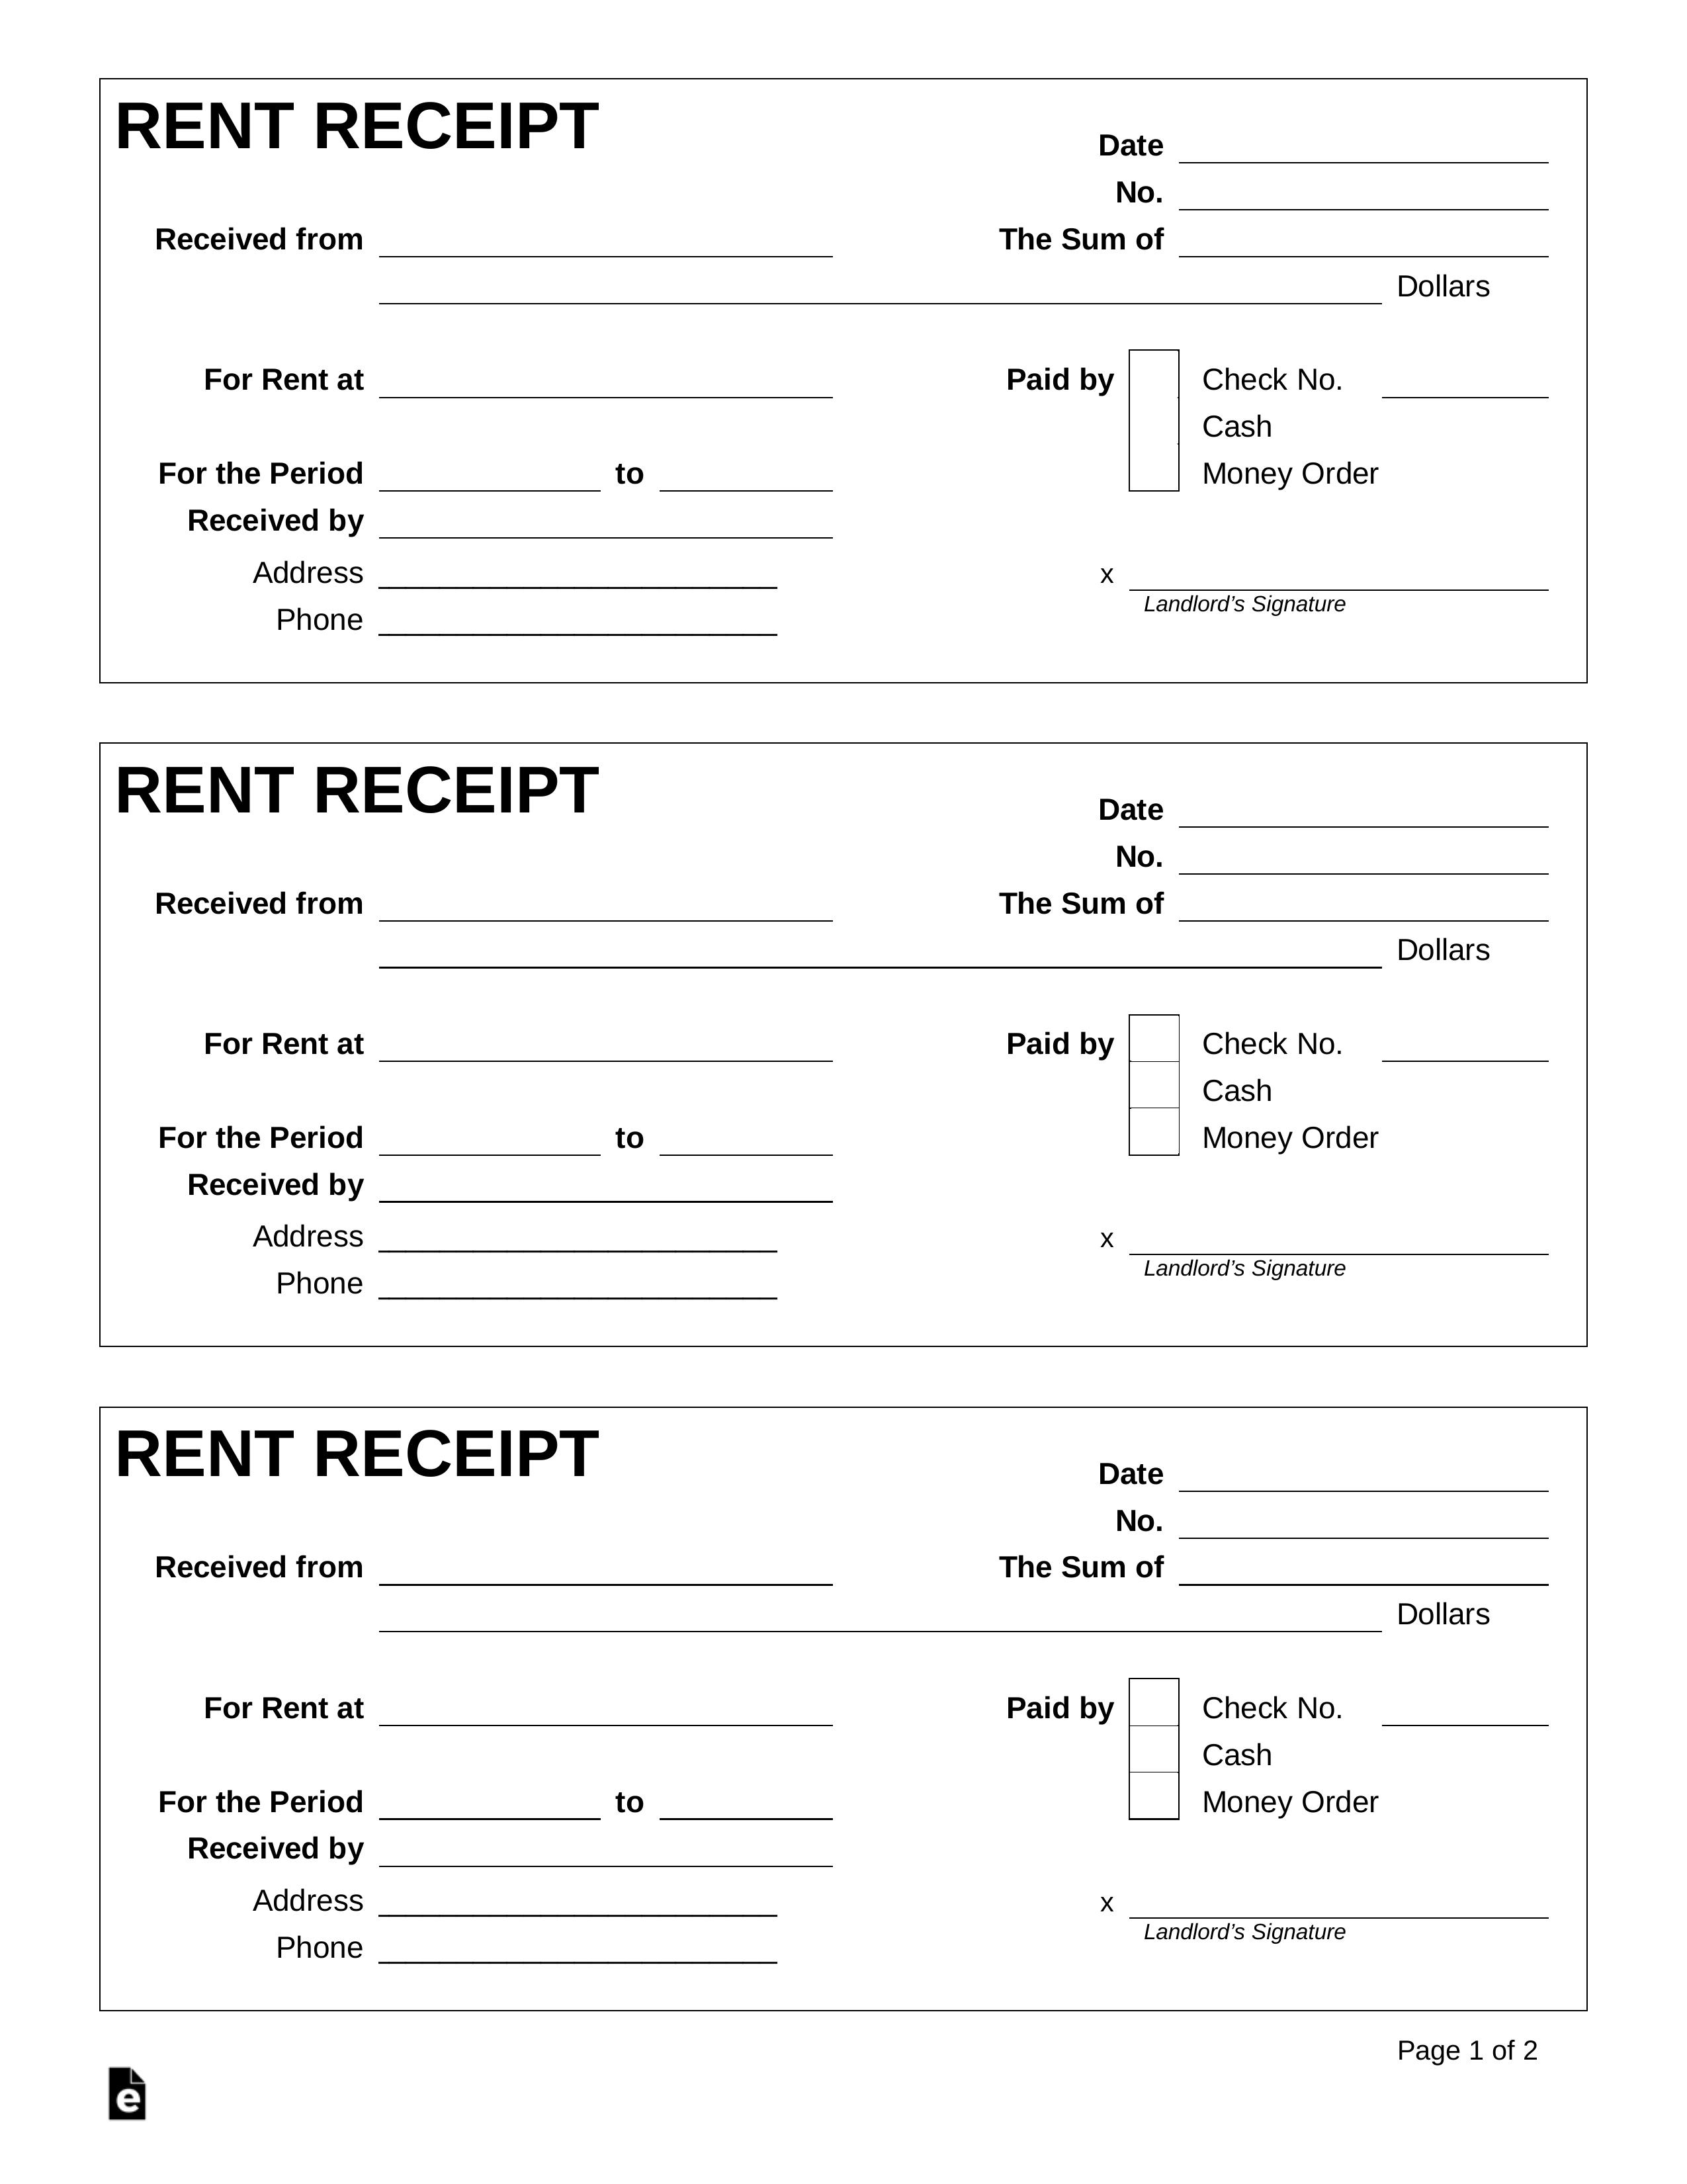 Free Rent Receipt Template